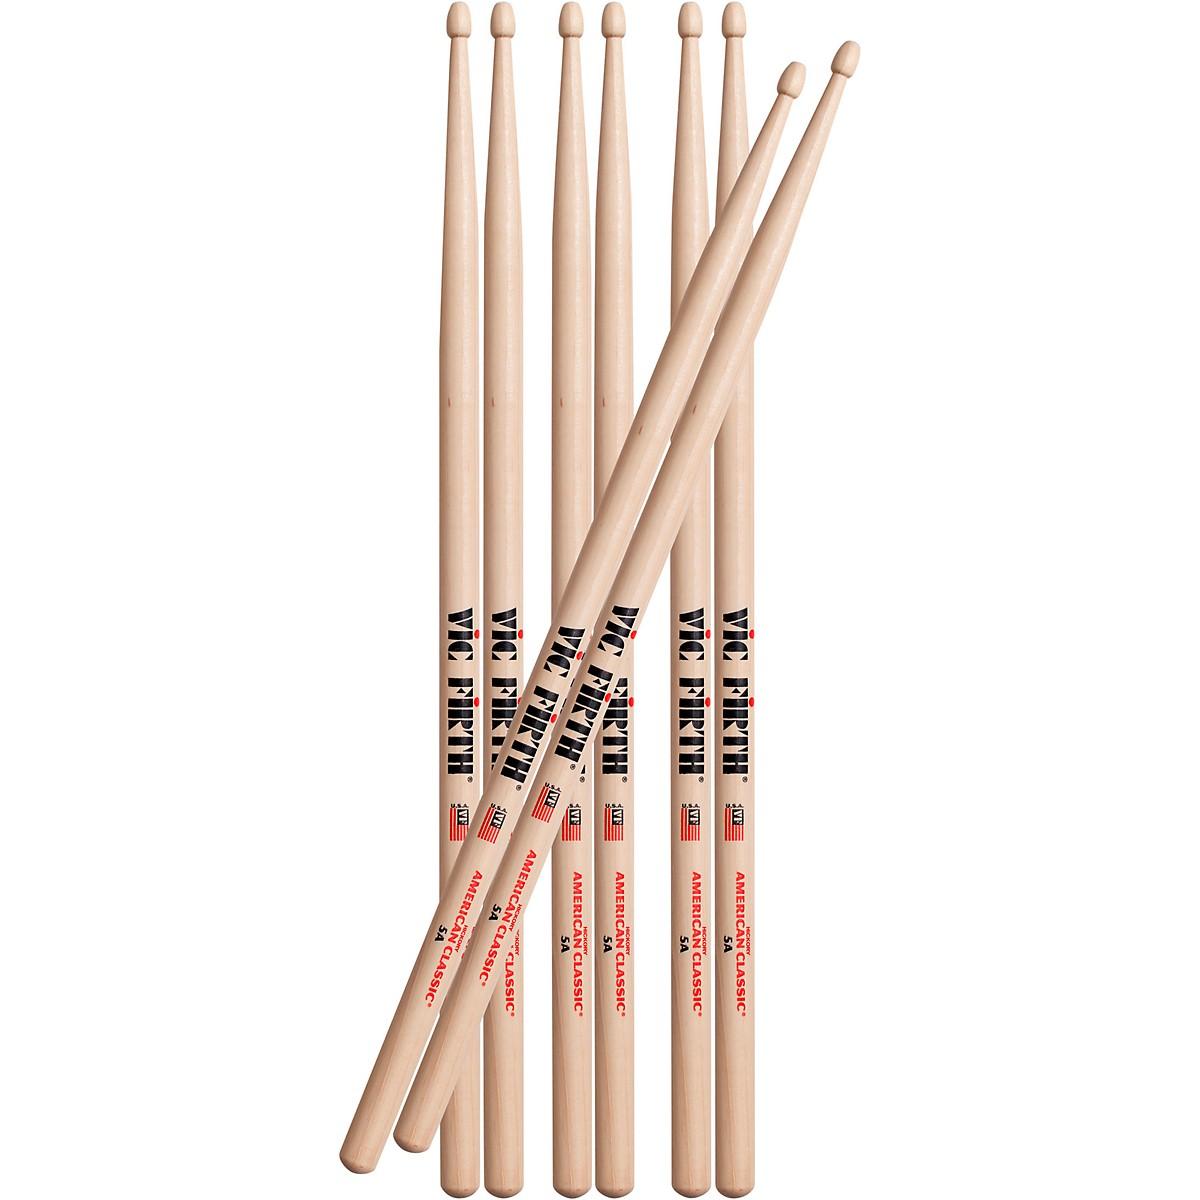 Vic Firth Buy 3 Pair 5A Drum Sticks, Get 1 Pair Free